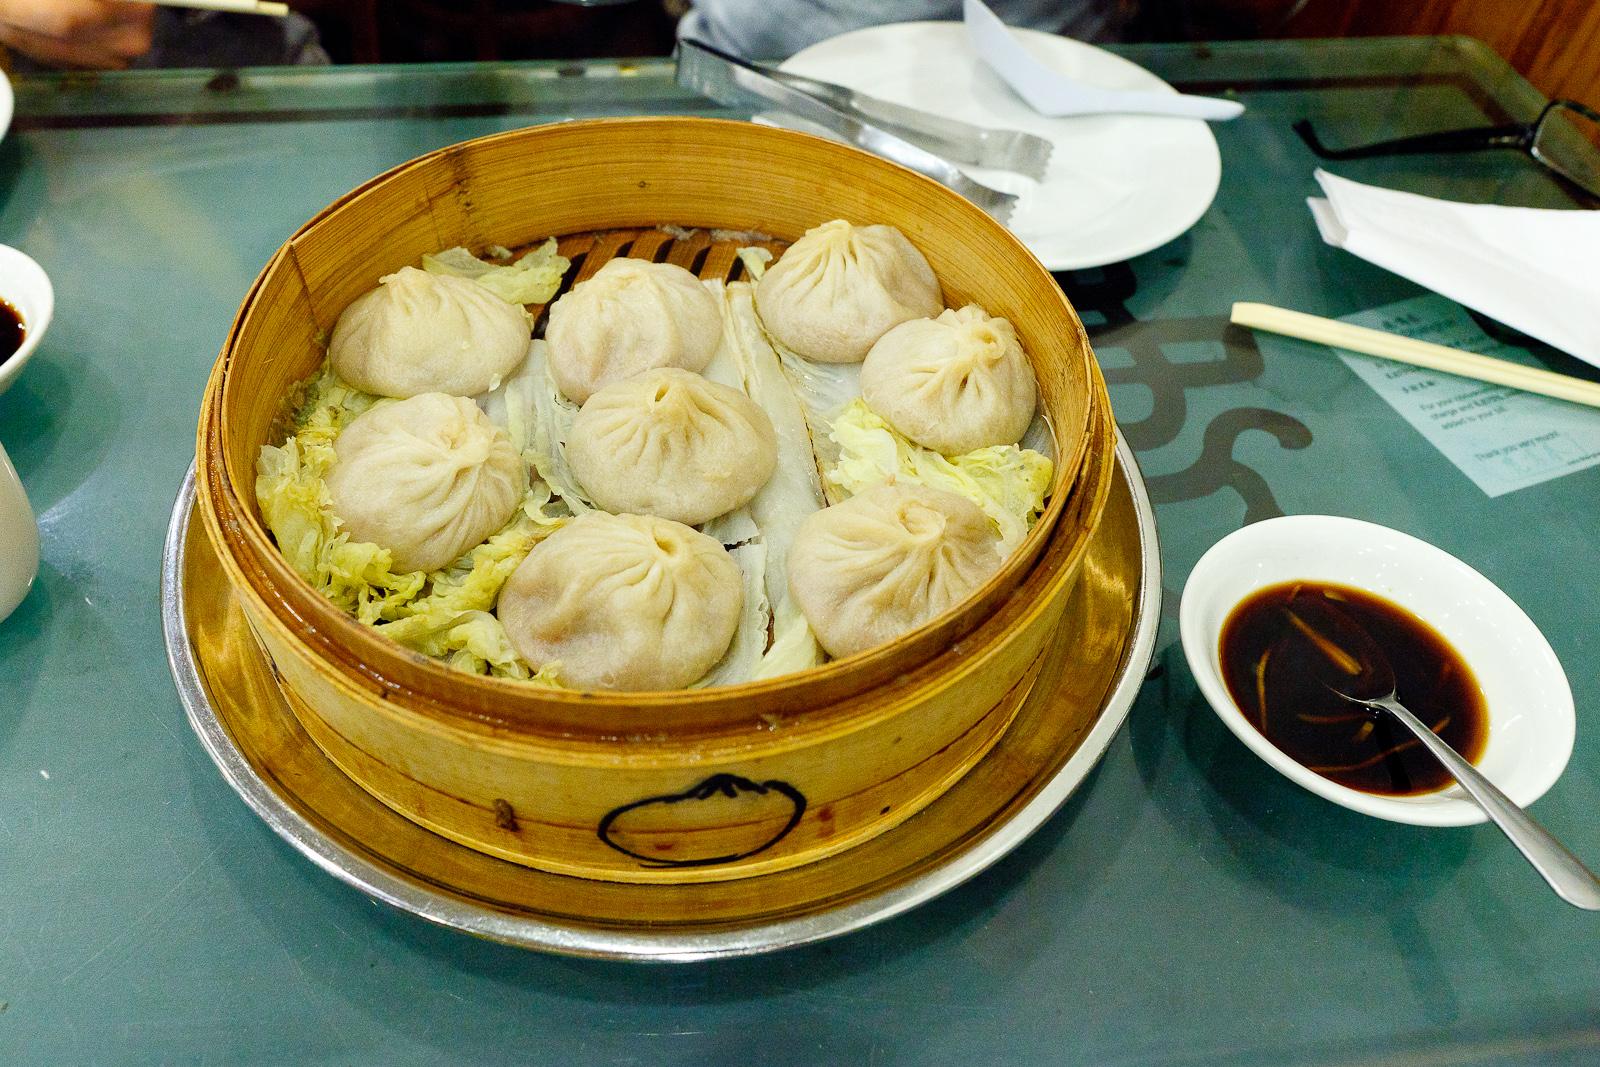 Steamed pork soup dumplings ($6.95)